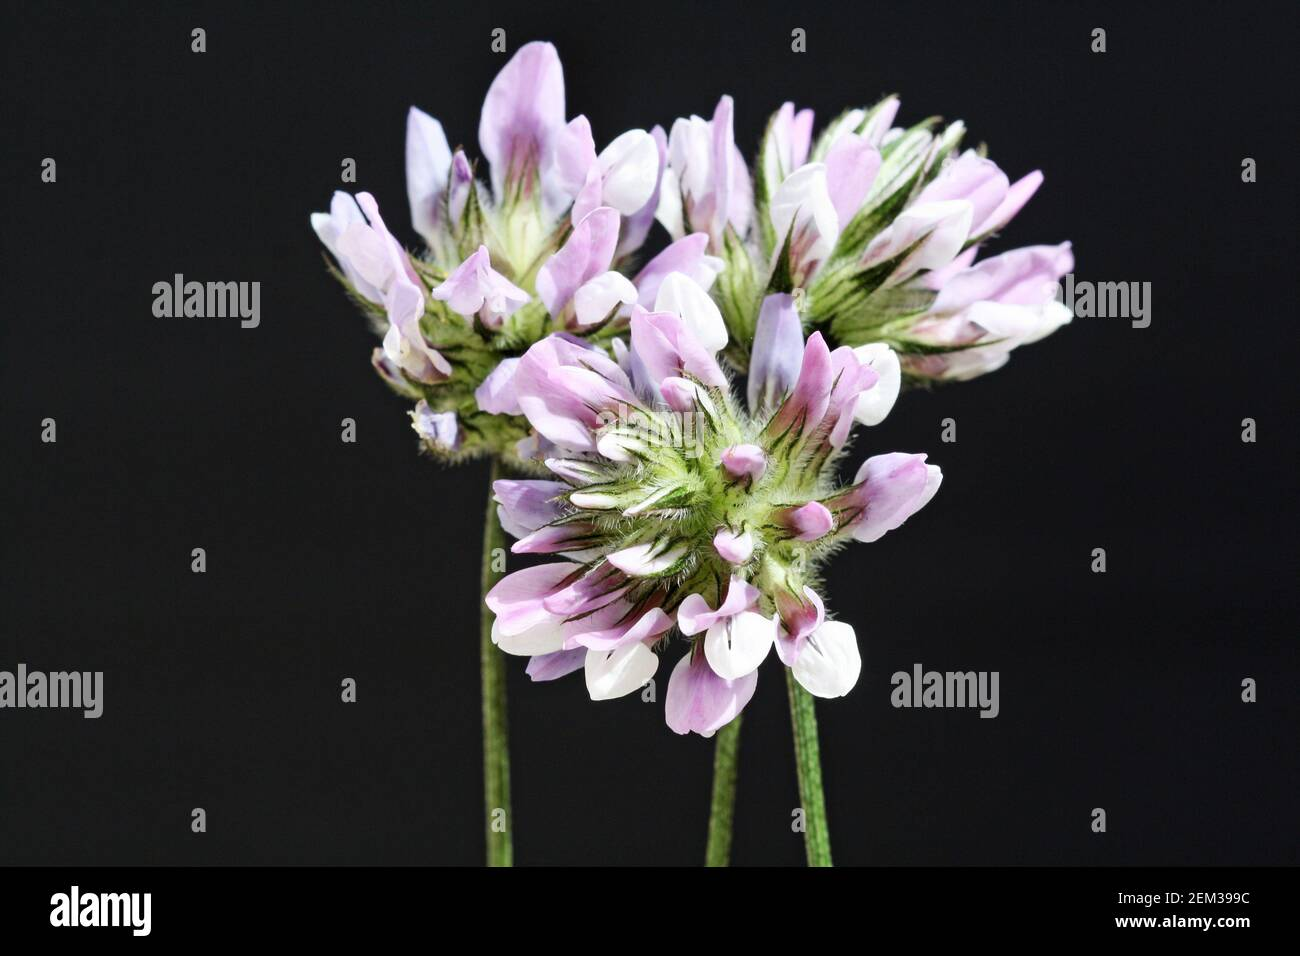 Asphaltklee Stock Photo